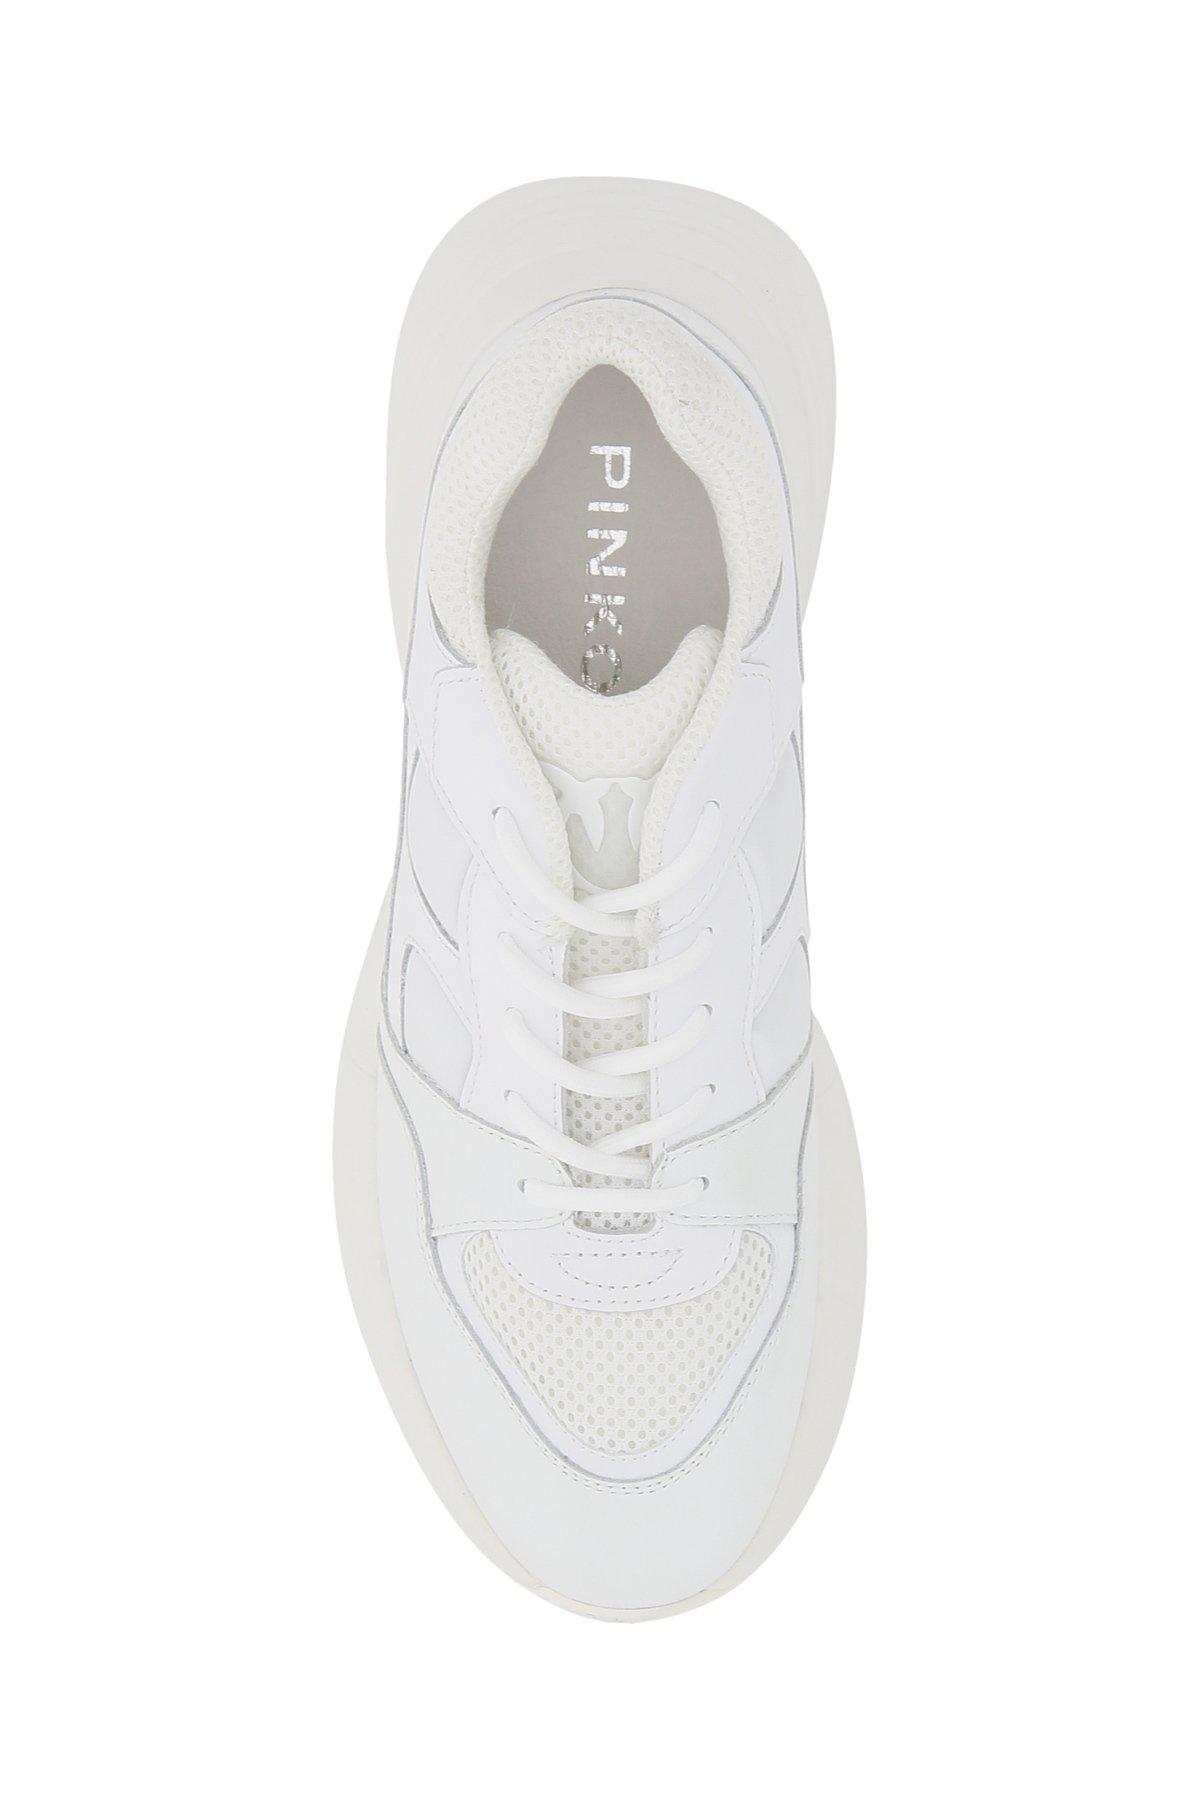 Pinko sneakers rubino 9